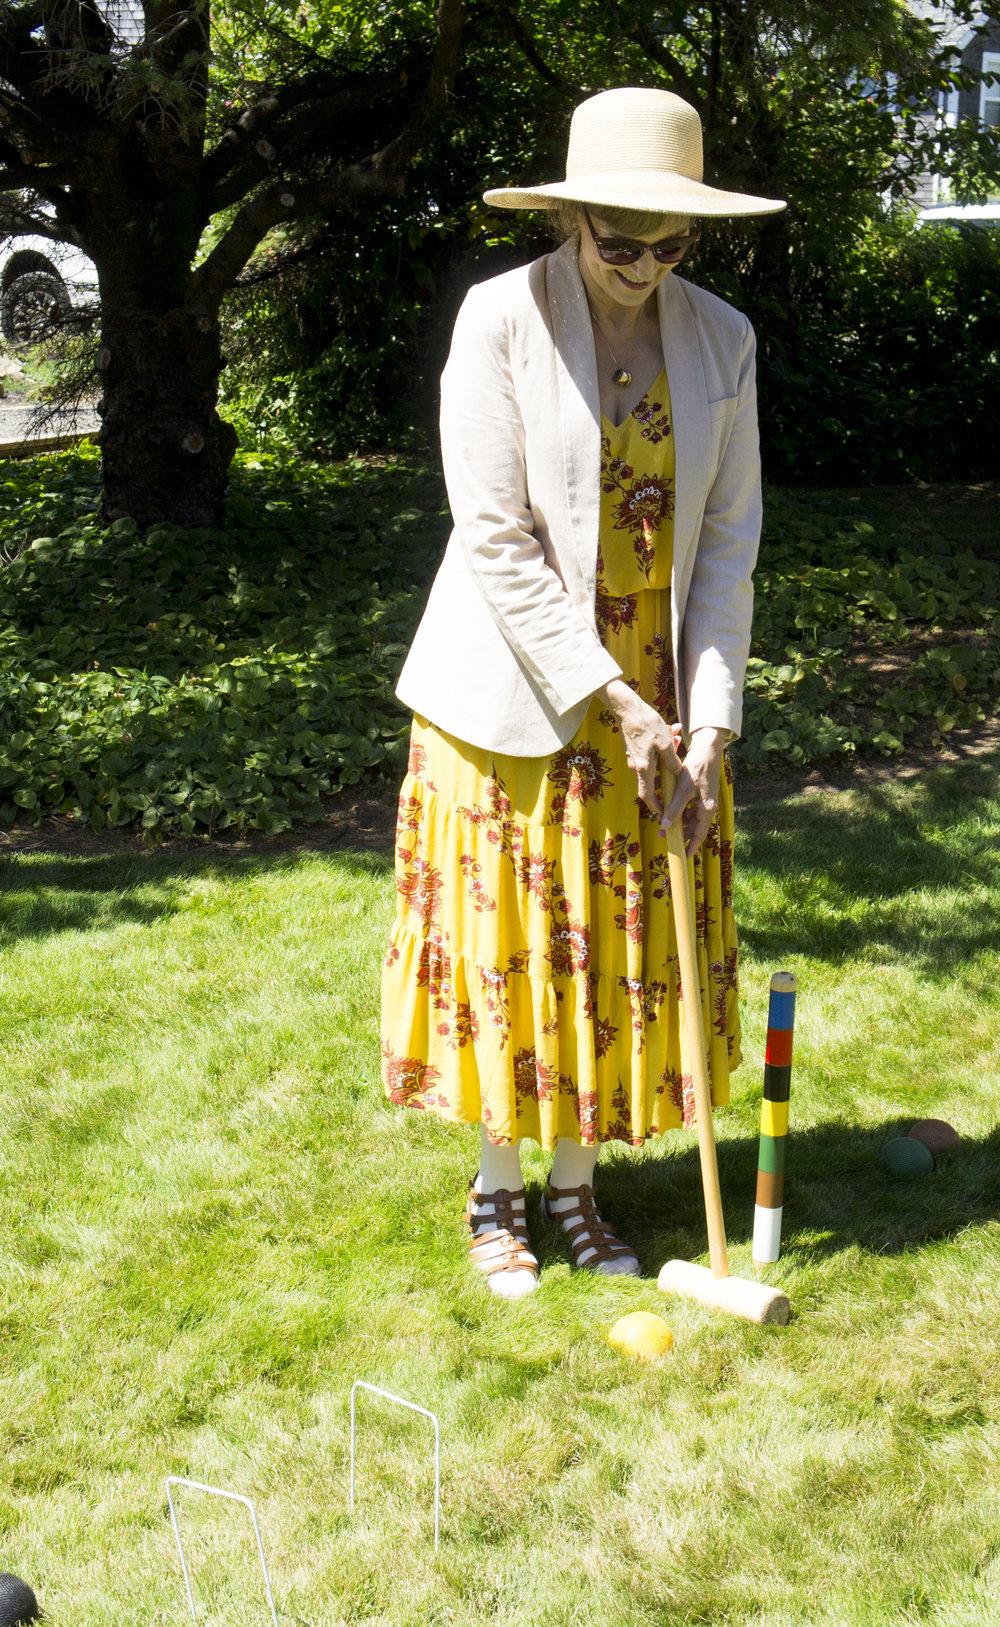 croquet player cannon beach, Oregon